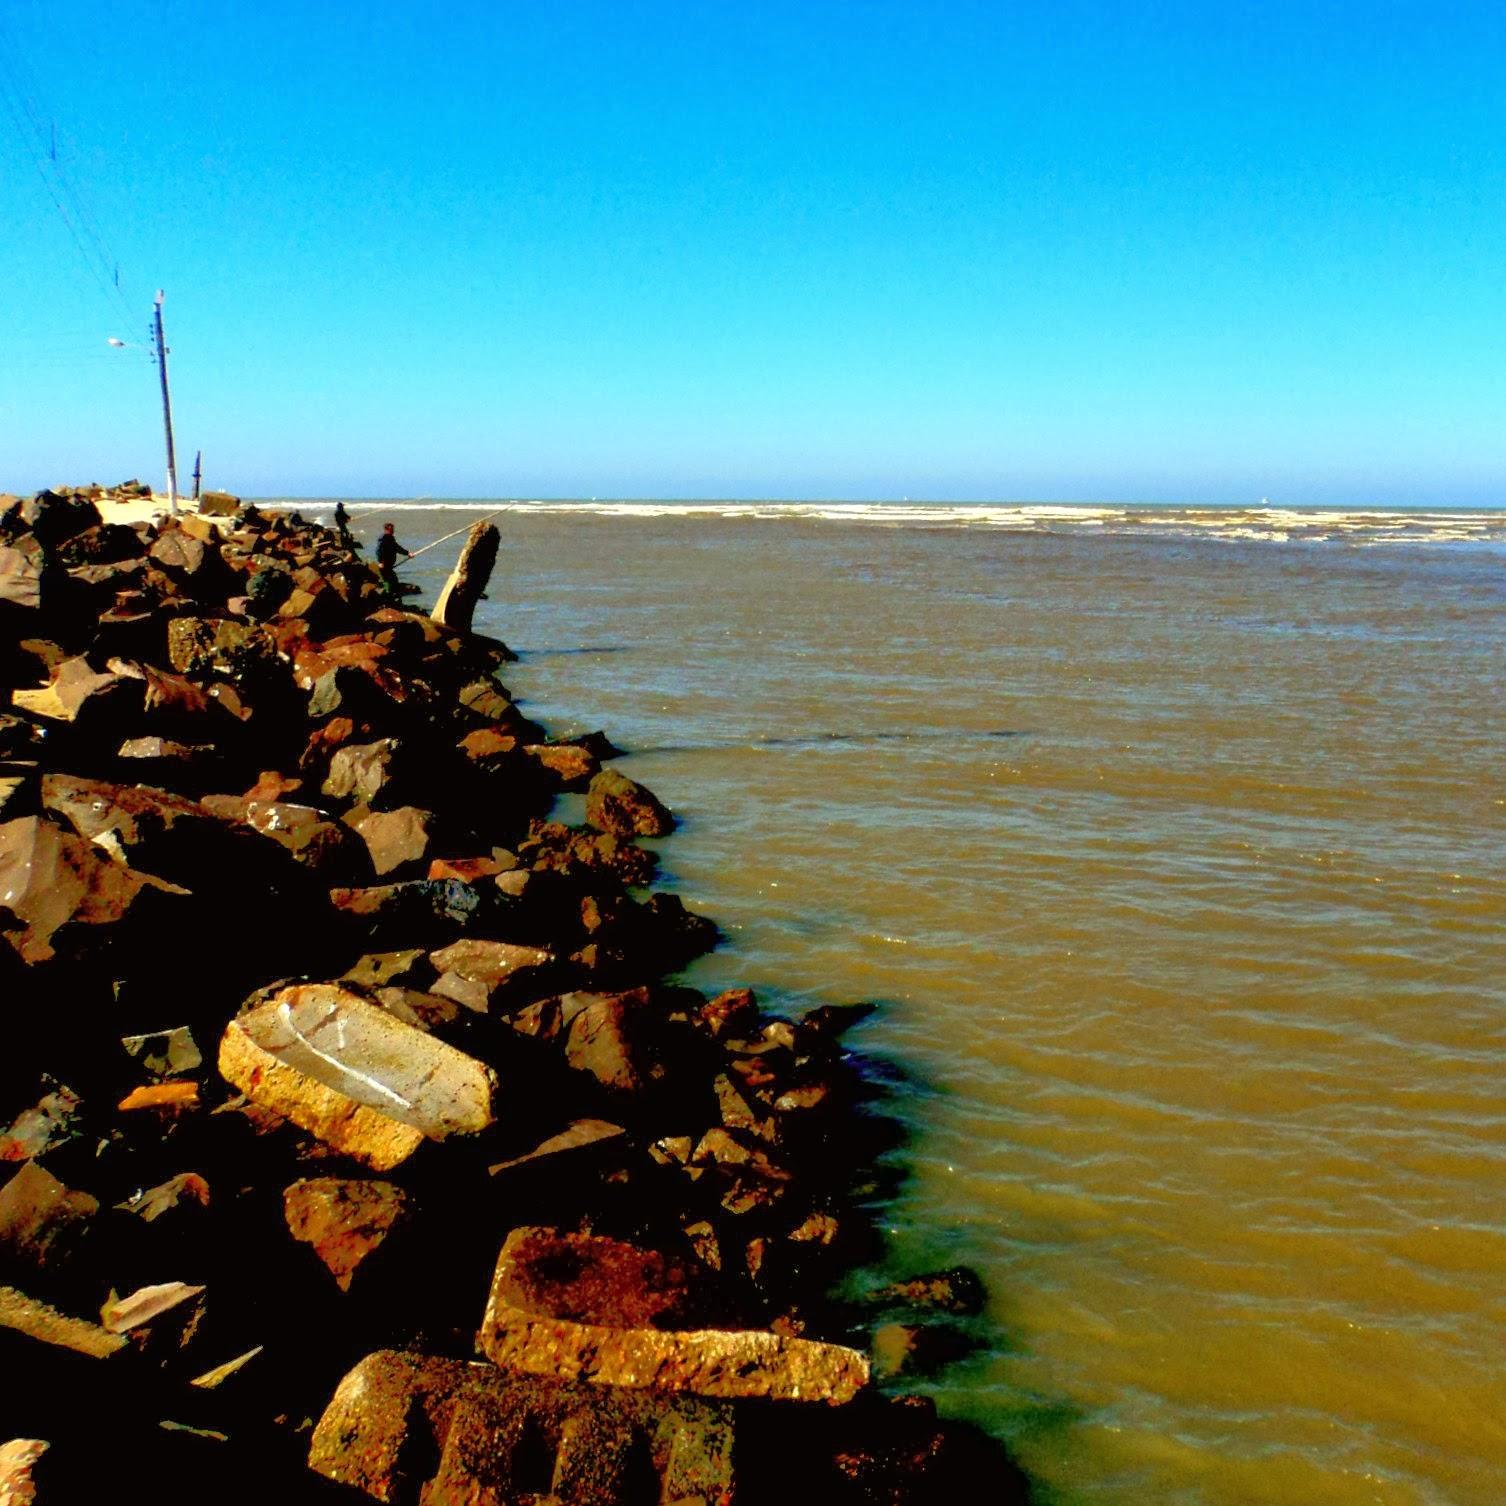 Molhes da Barra do Rio Tramandaí